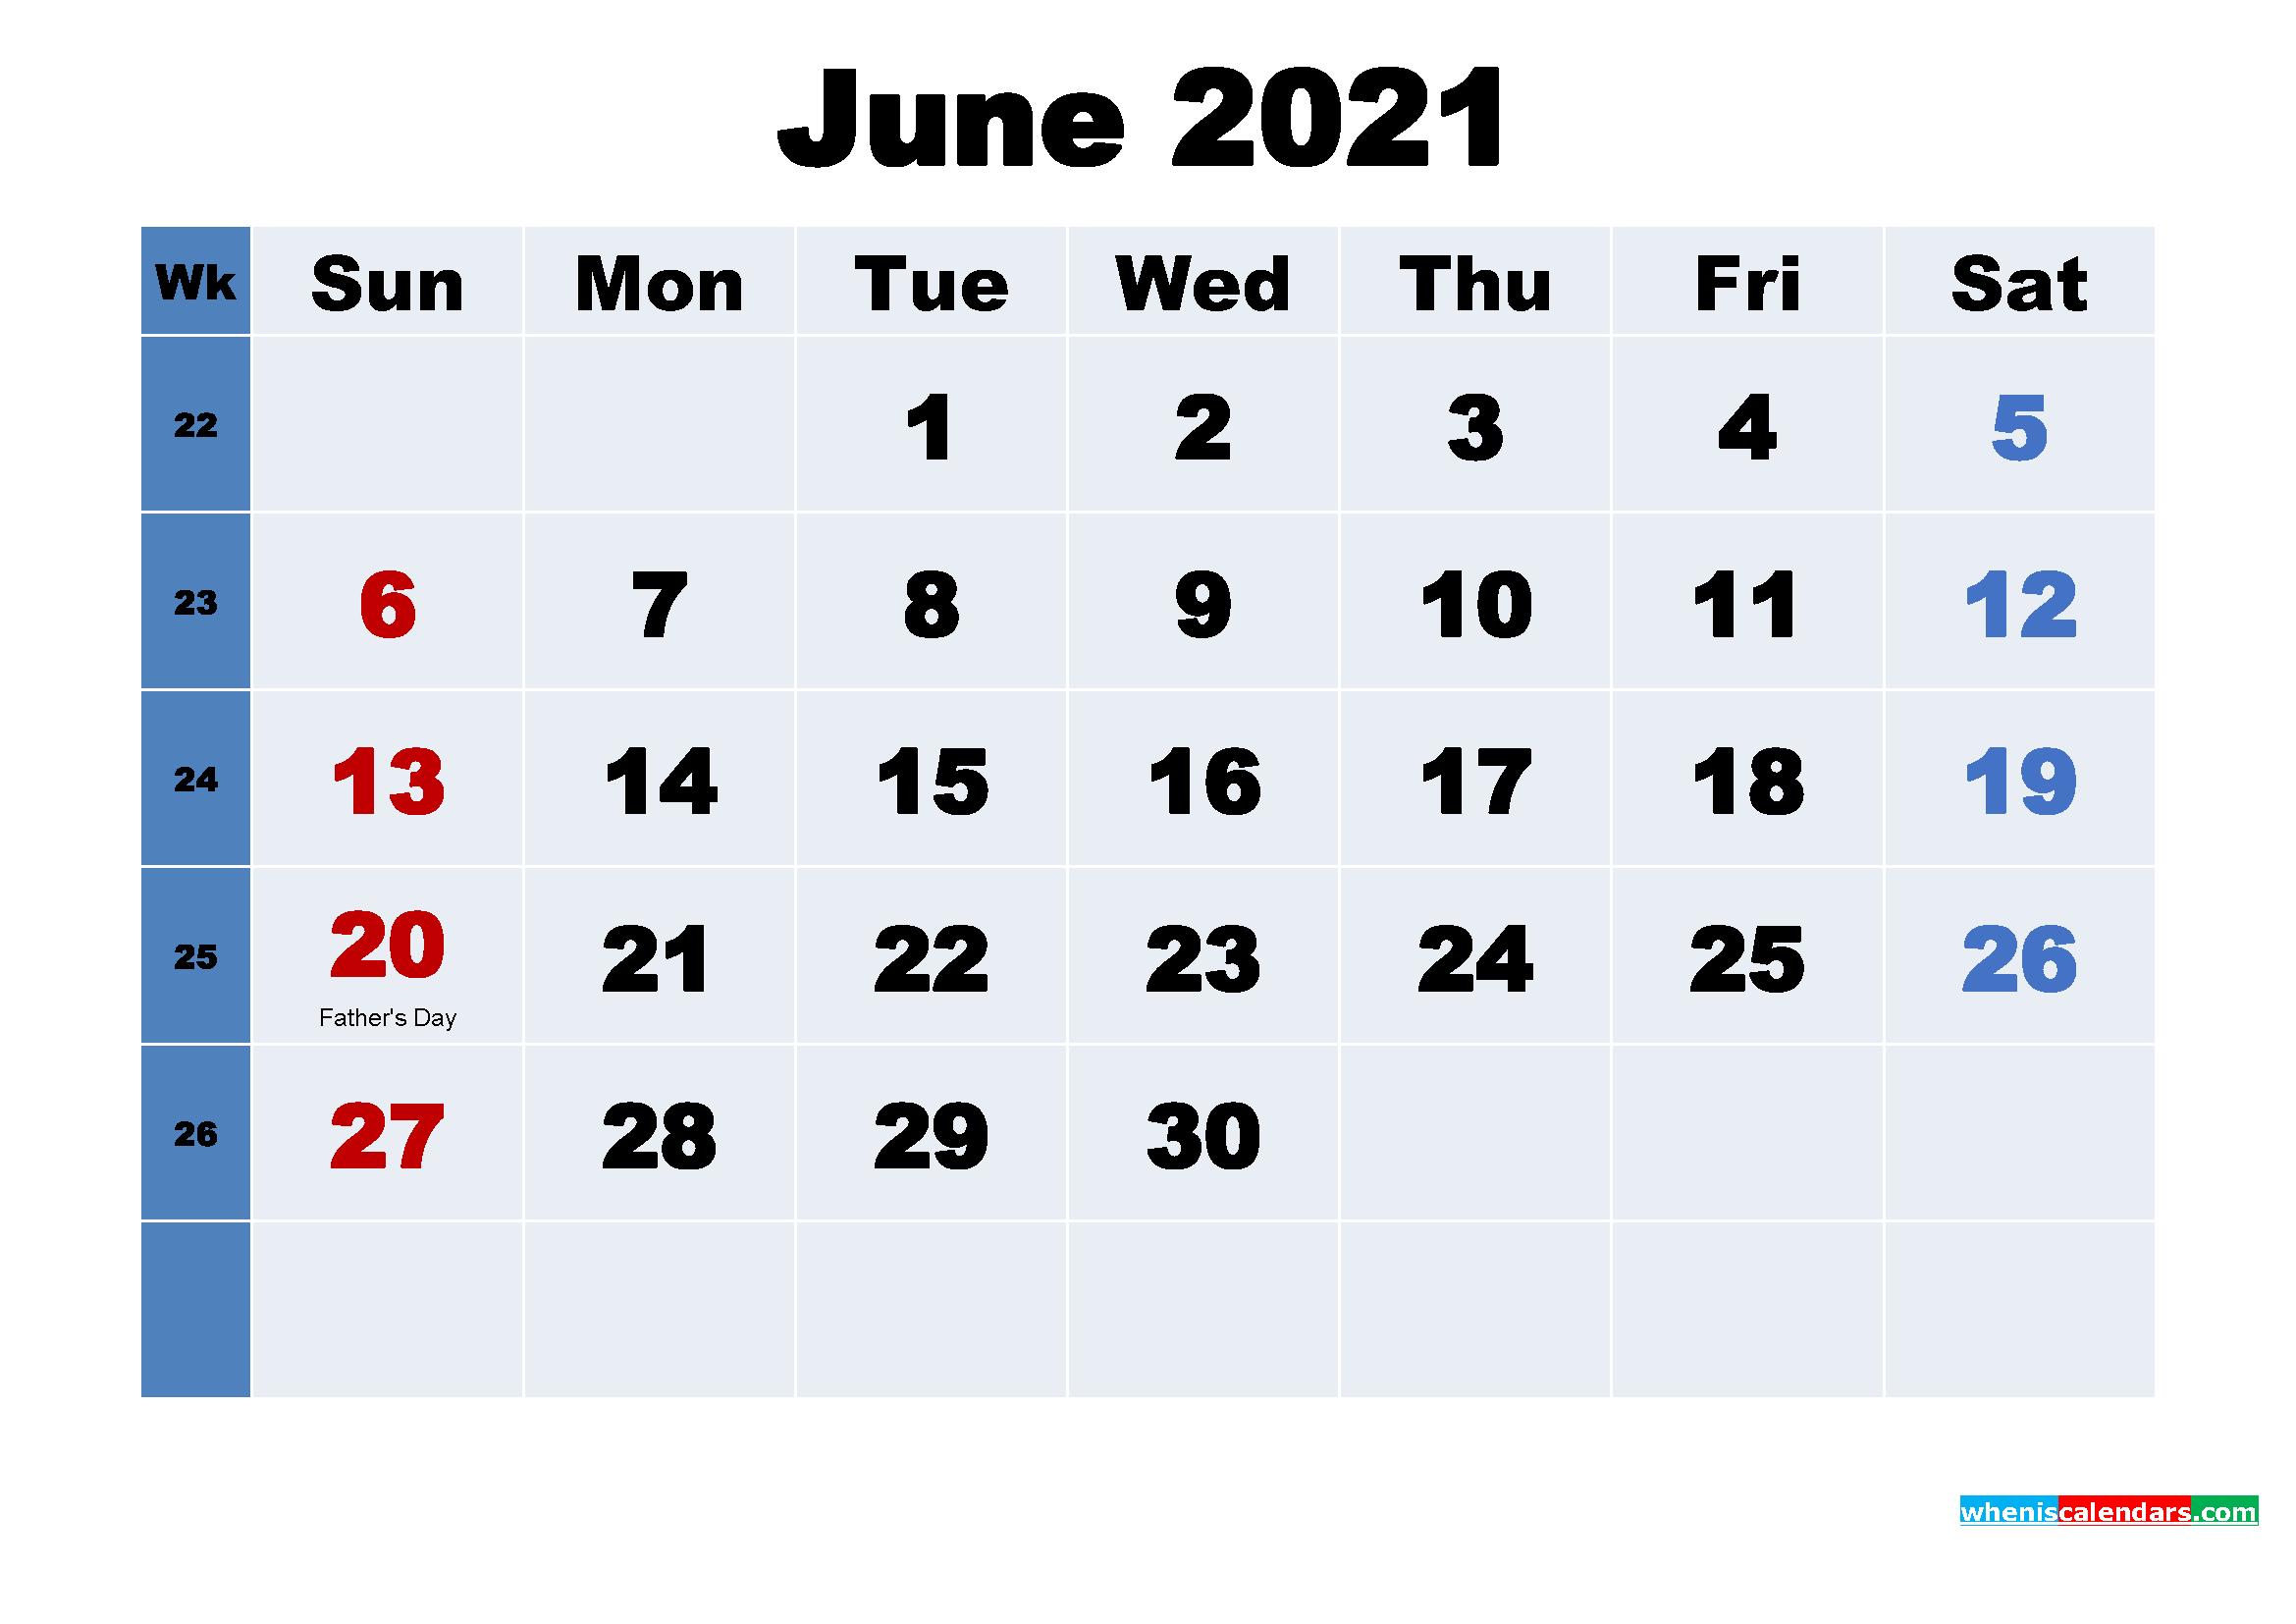 June 2021 Desktop Calendar with Holidays